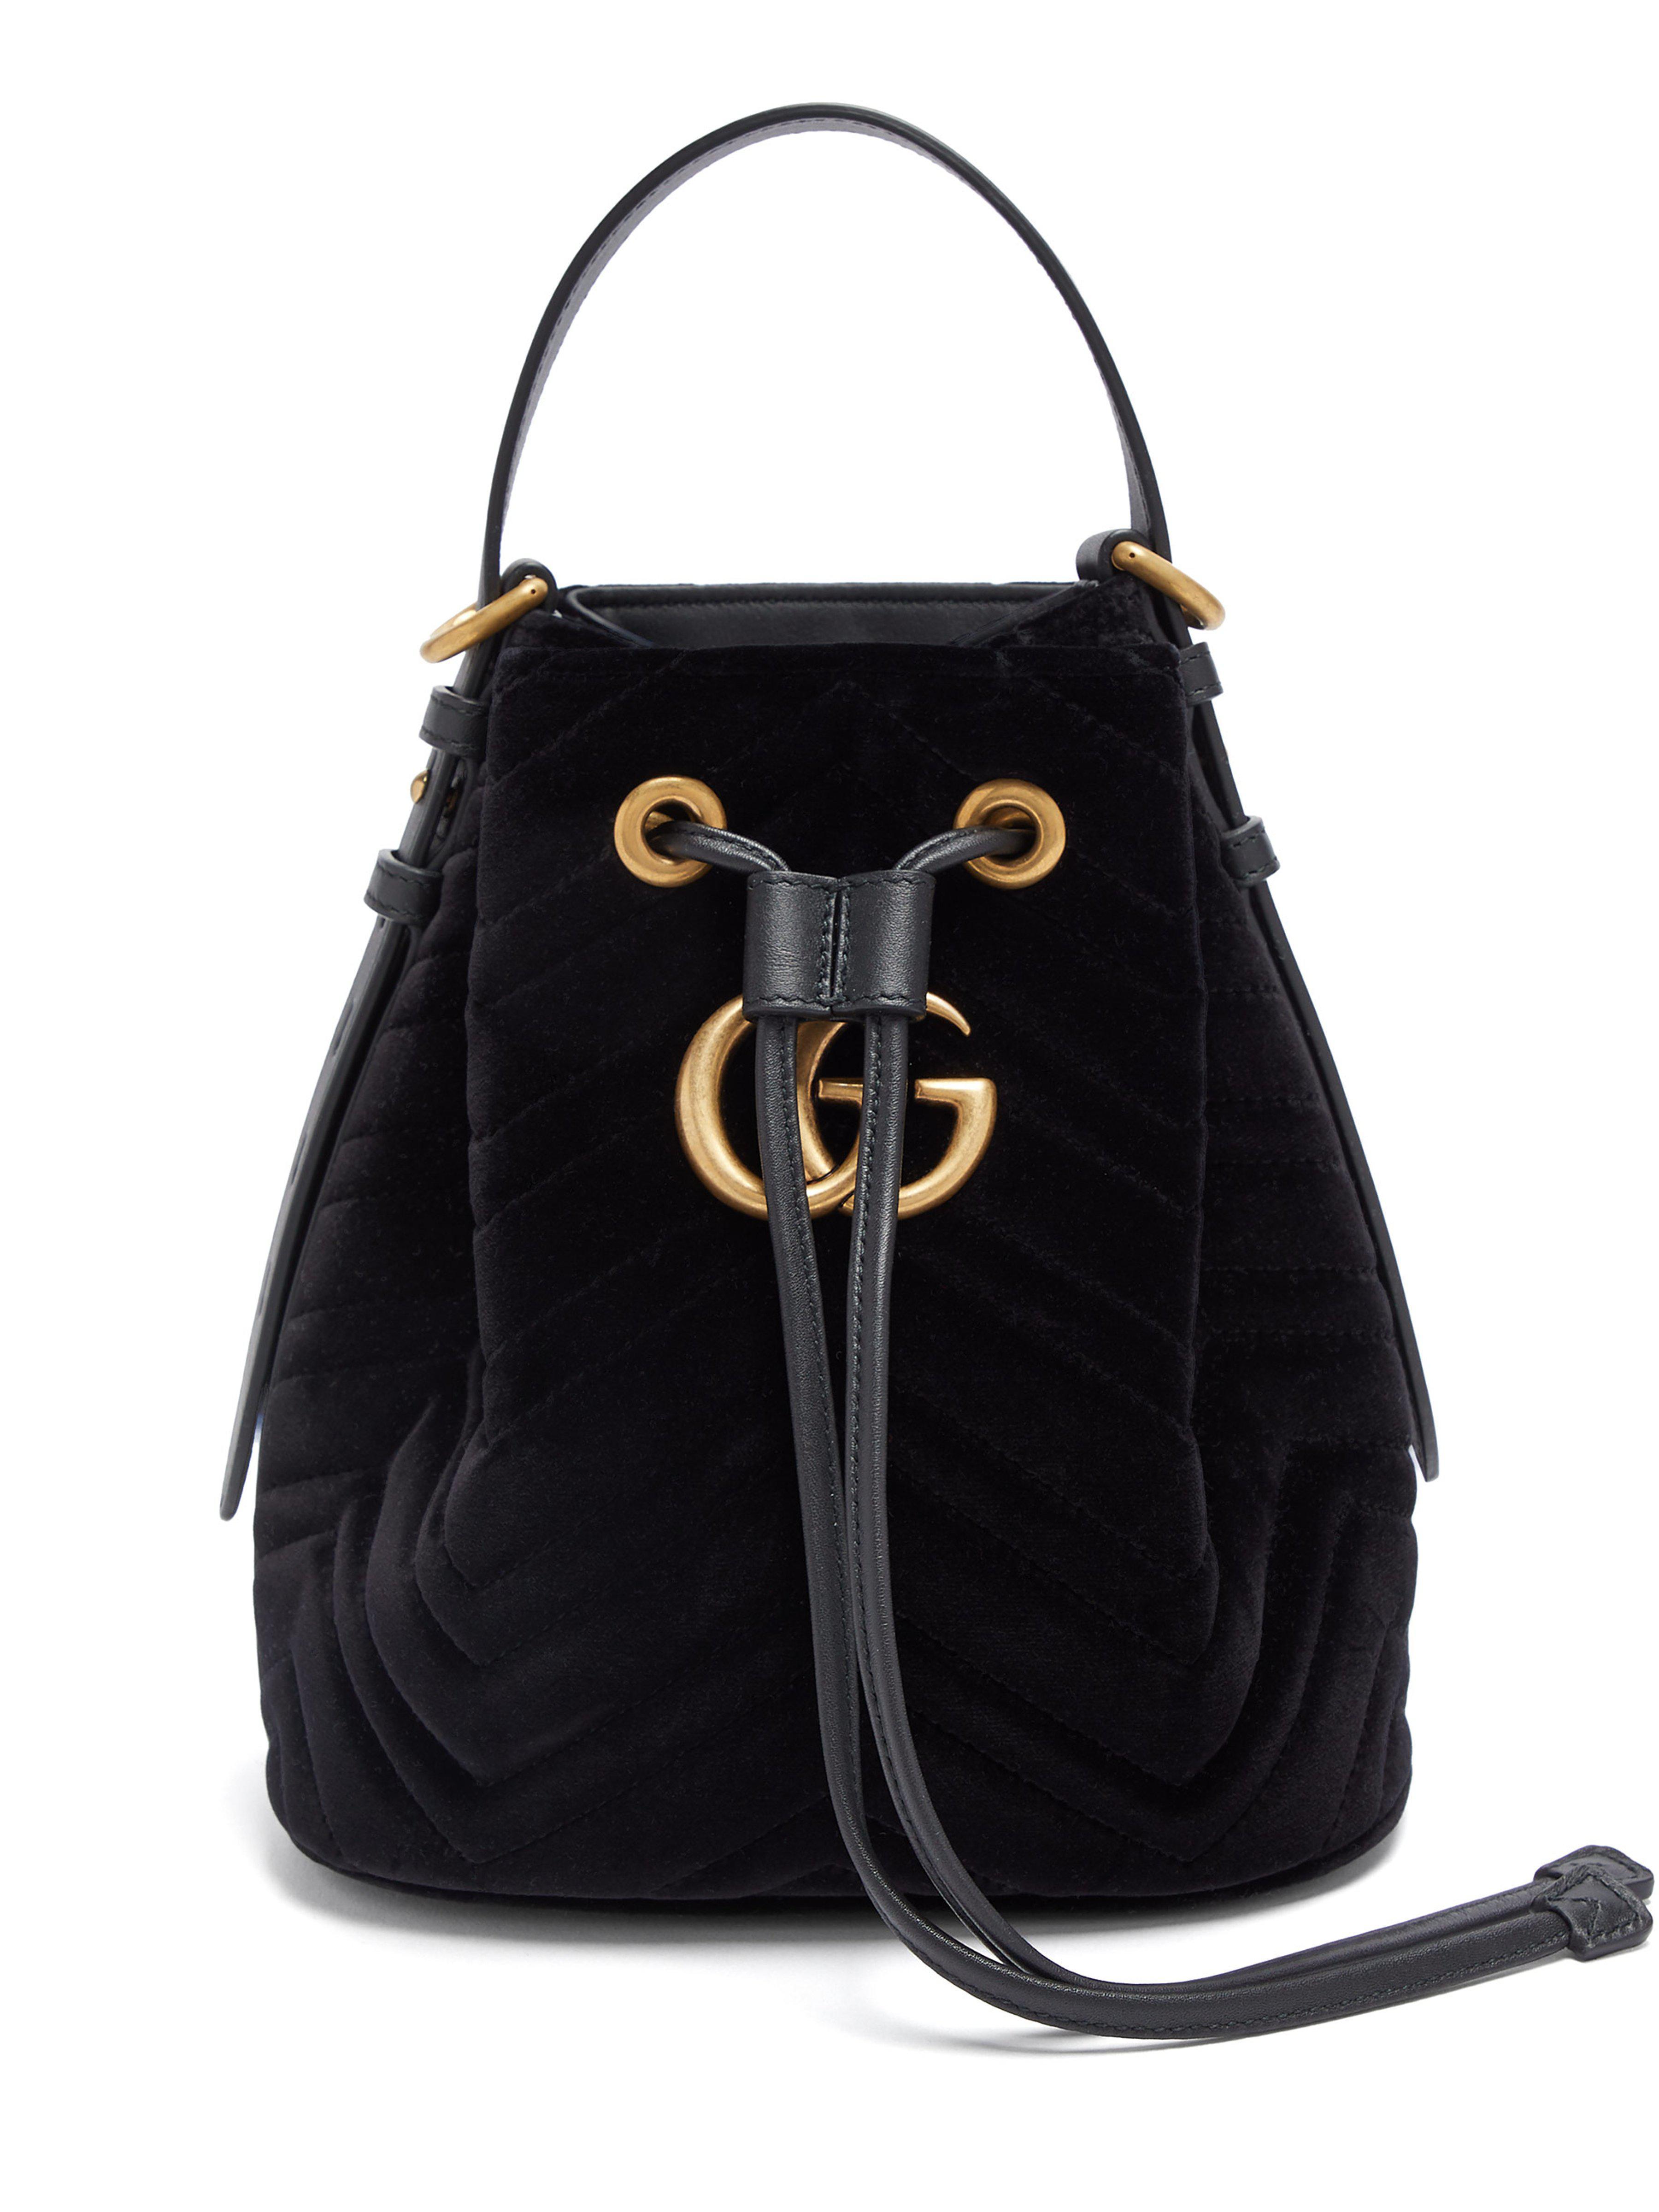 Gucci Gg Marmont Velvet Bucket Bag in Black - Lyst e8833bba7a602